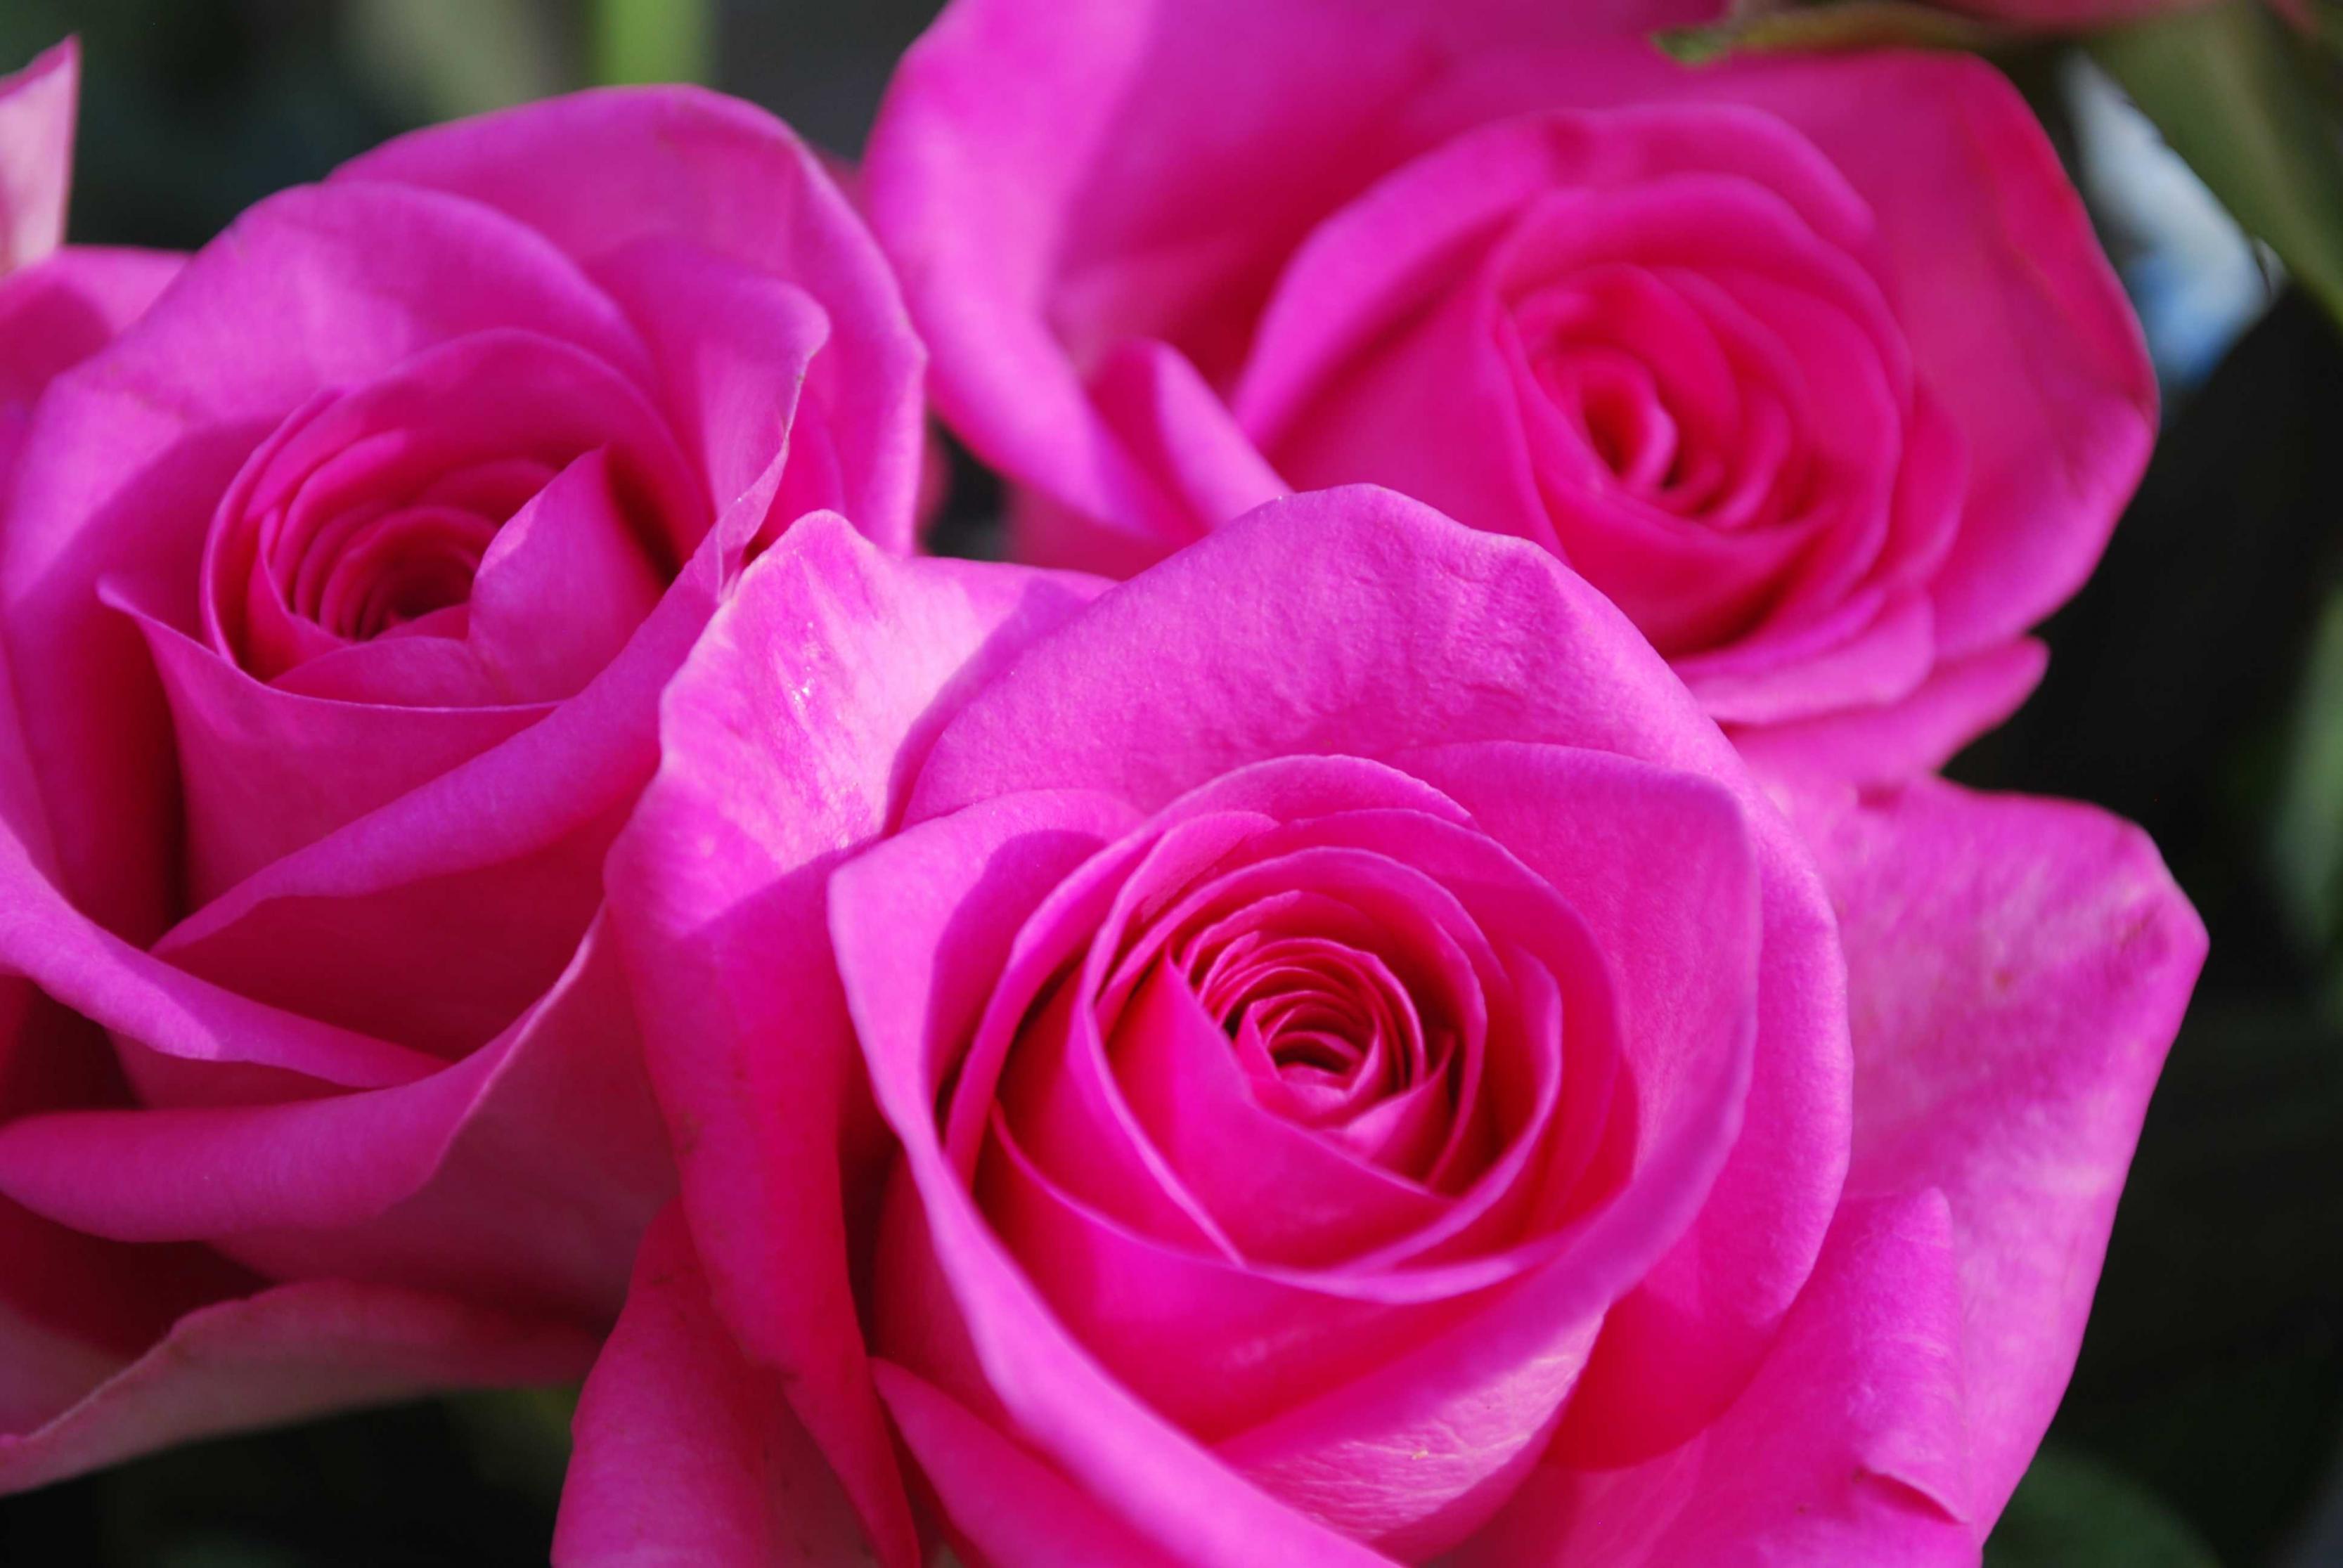 صورة صور ورد خلفيات , اجمل صور الورد